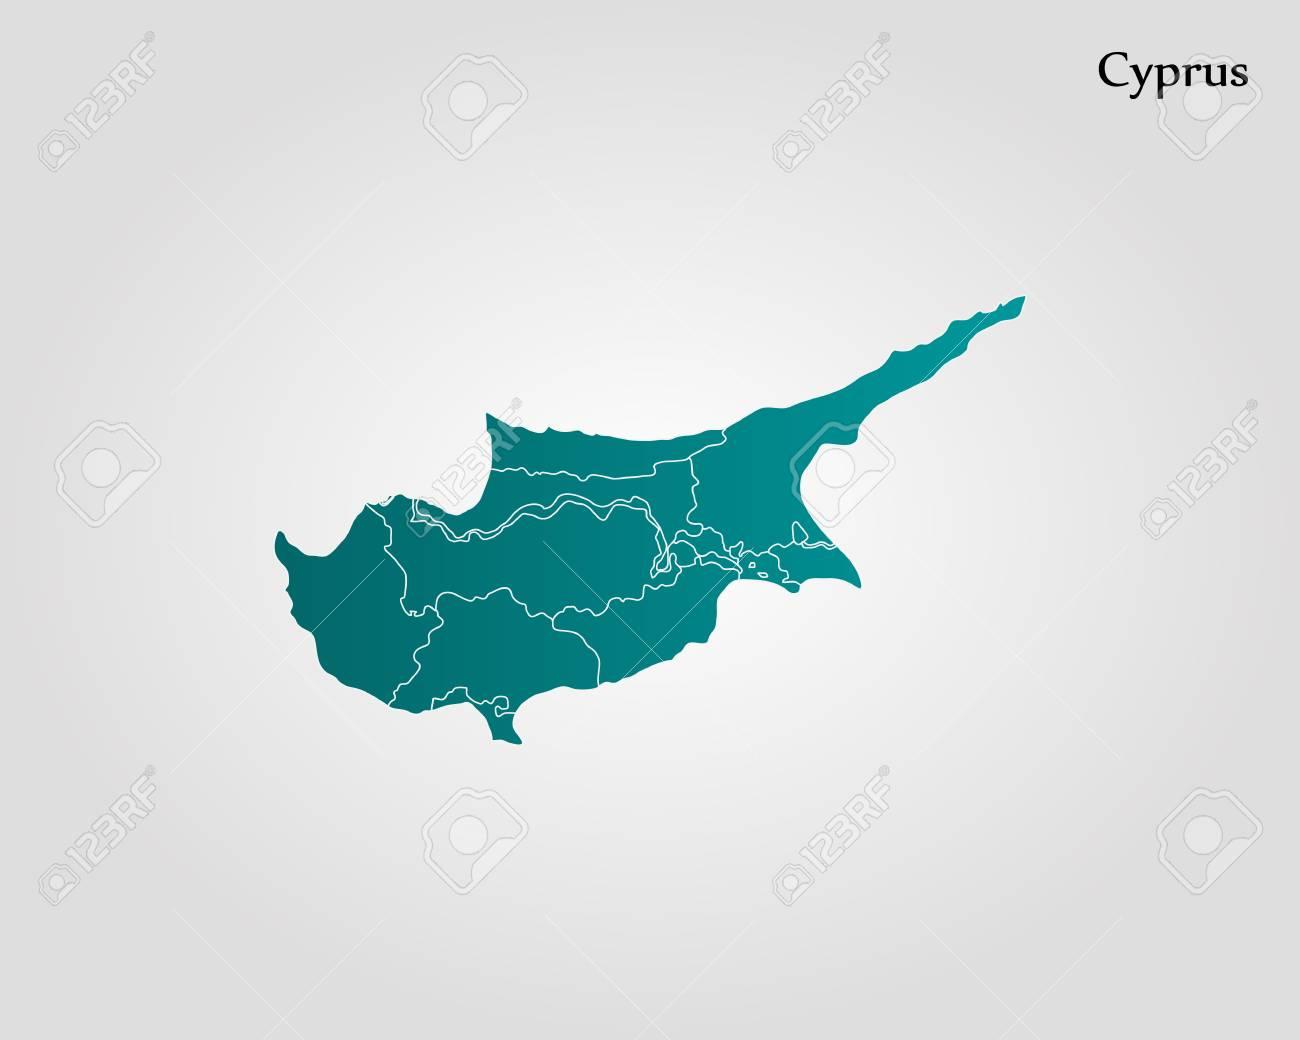 Map of cyprus vector illustration world map royalty free cliparts map of cyprus vector illustration world map stock vector 89750733 gumiabroncs Image collections